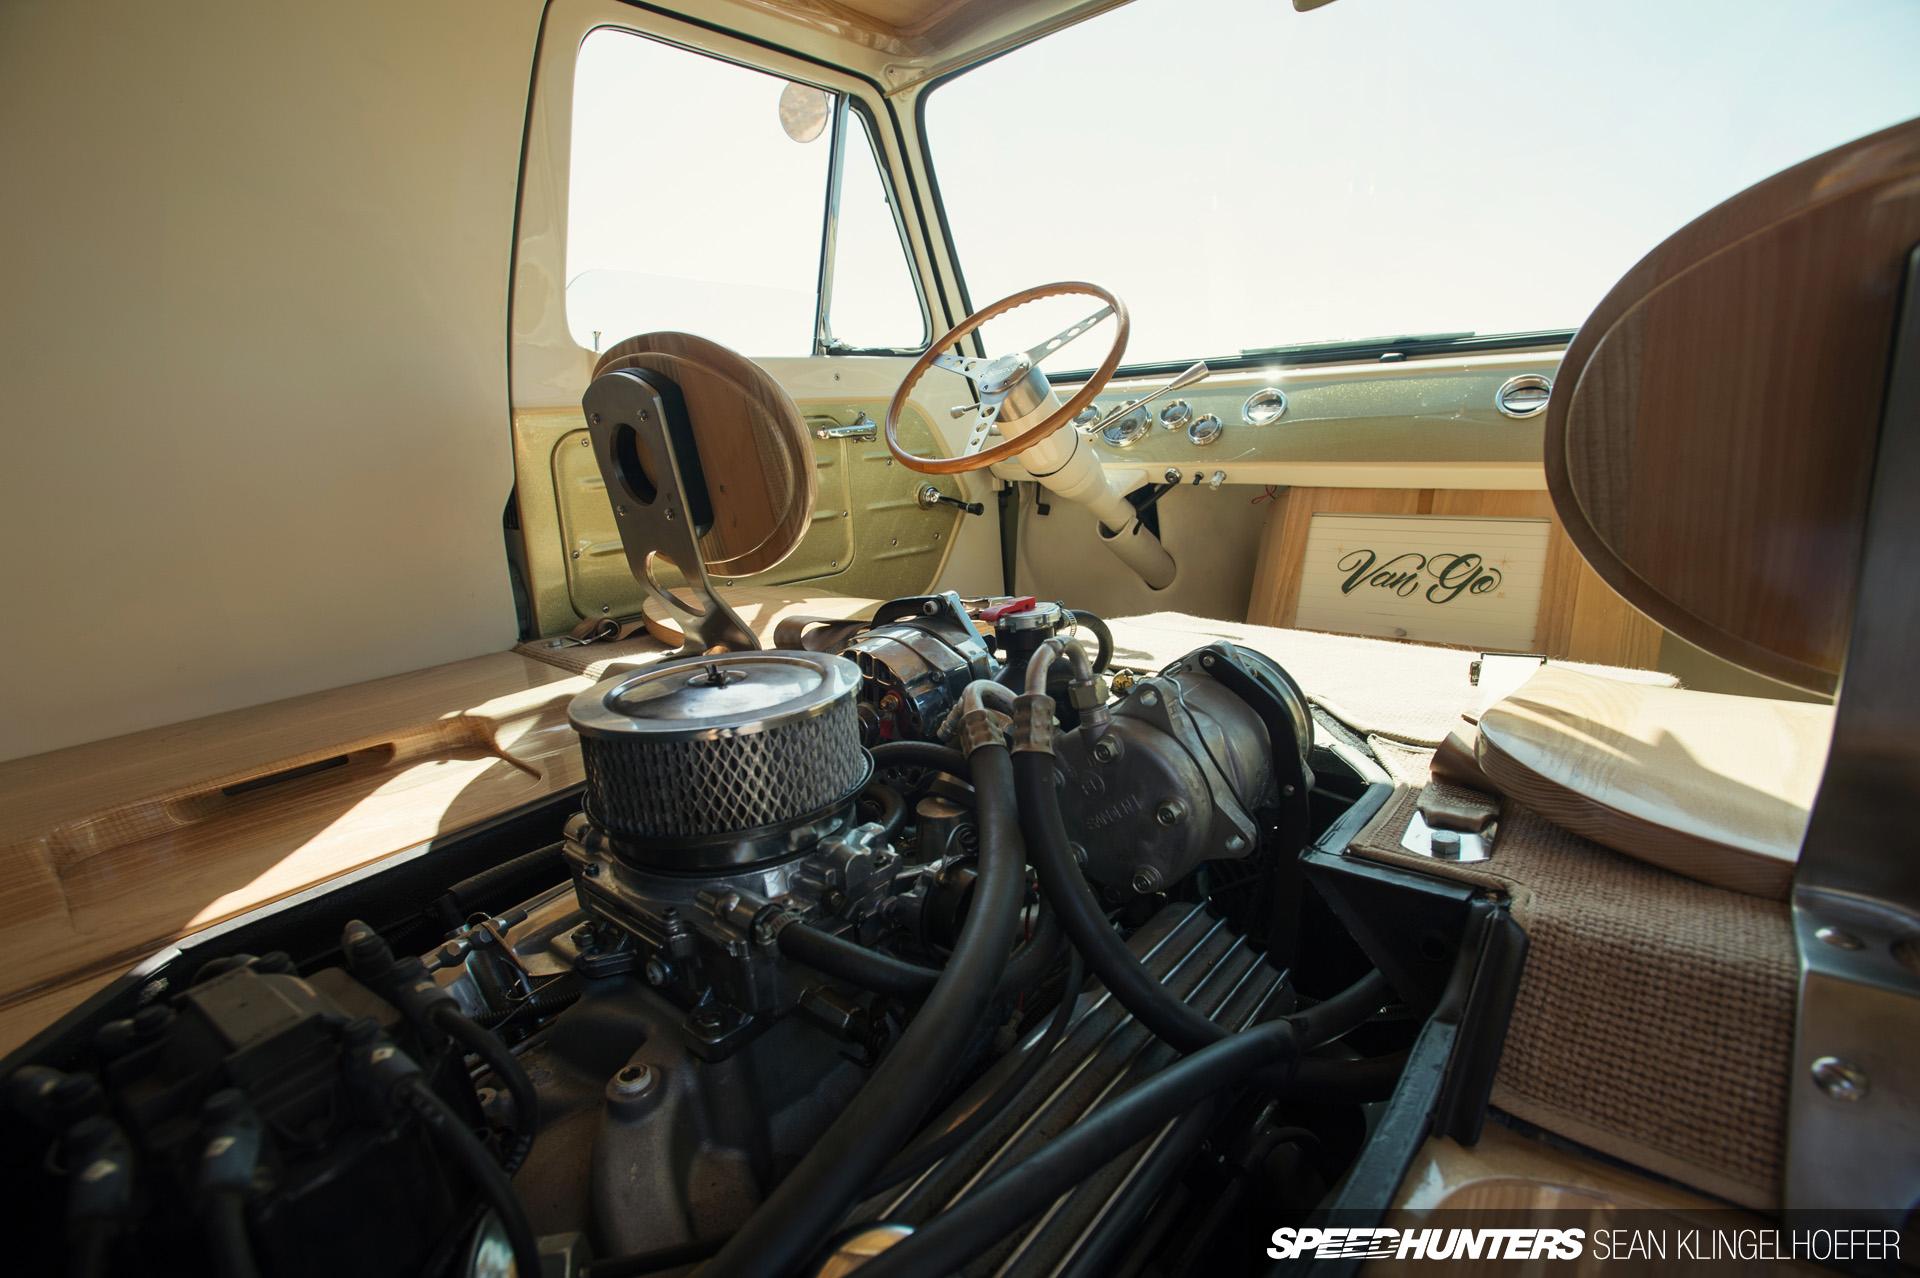 hight resolution of 1963 ford econoline van tuning lowrider classic interior engine f wallpaper 1920x1278 188129 wallpaperup